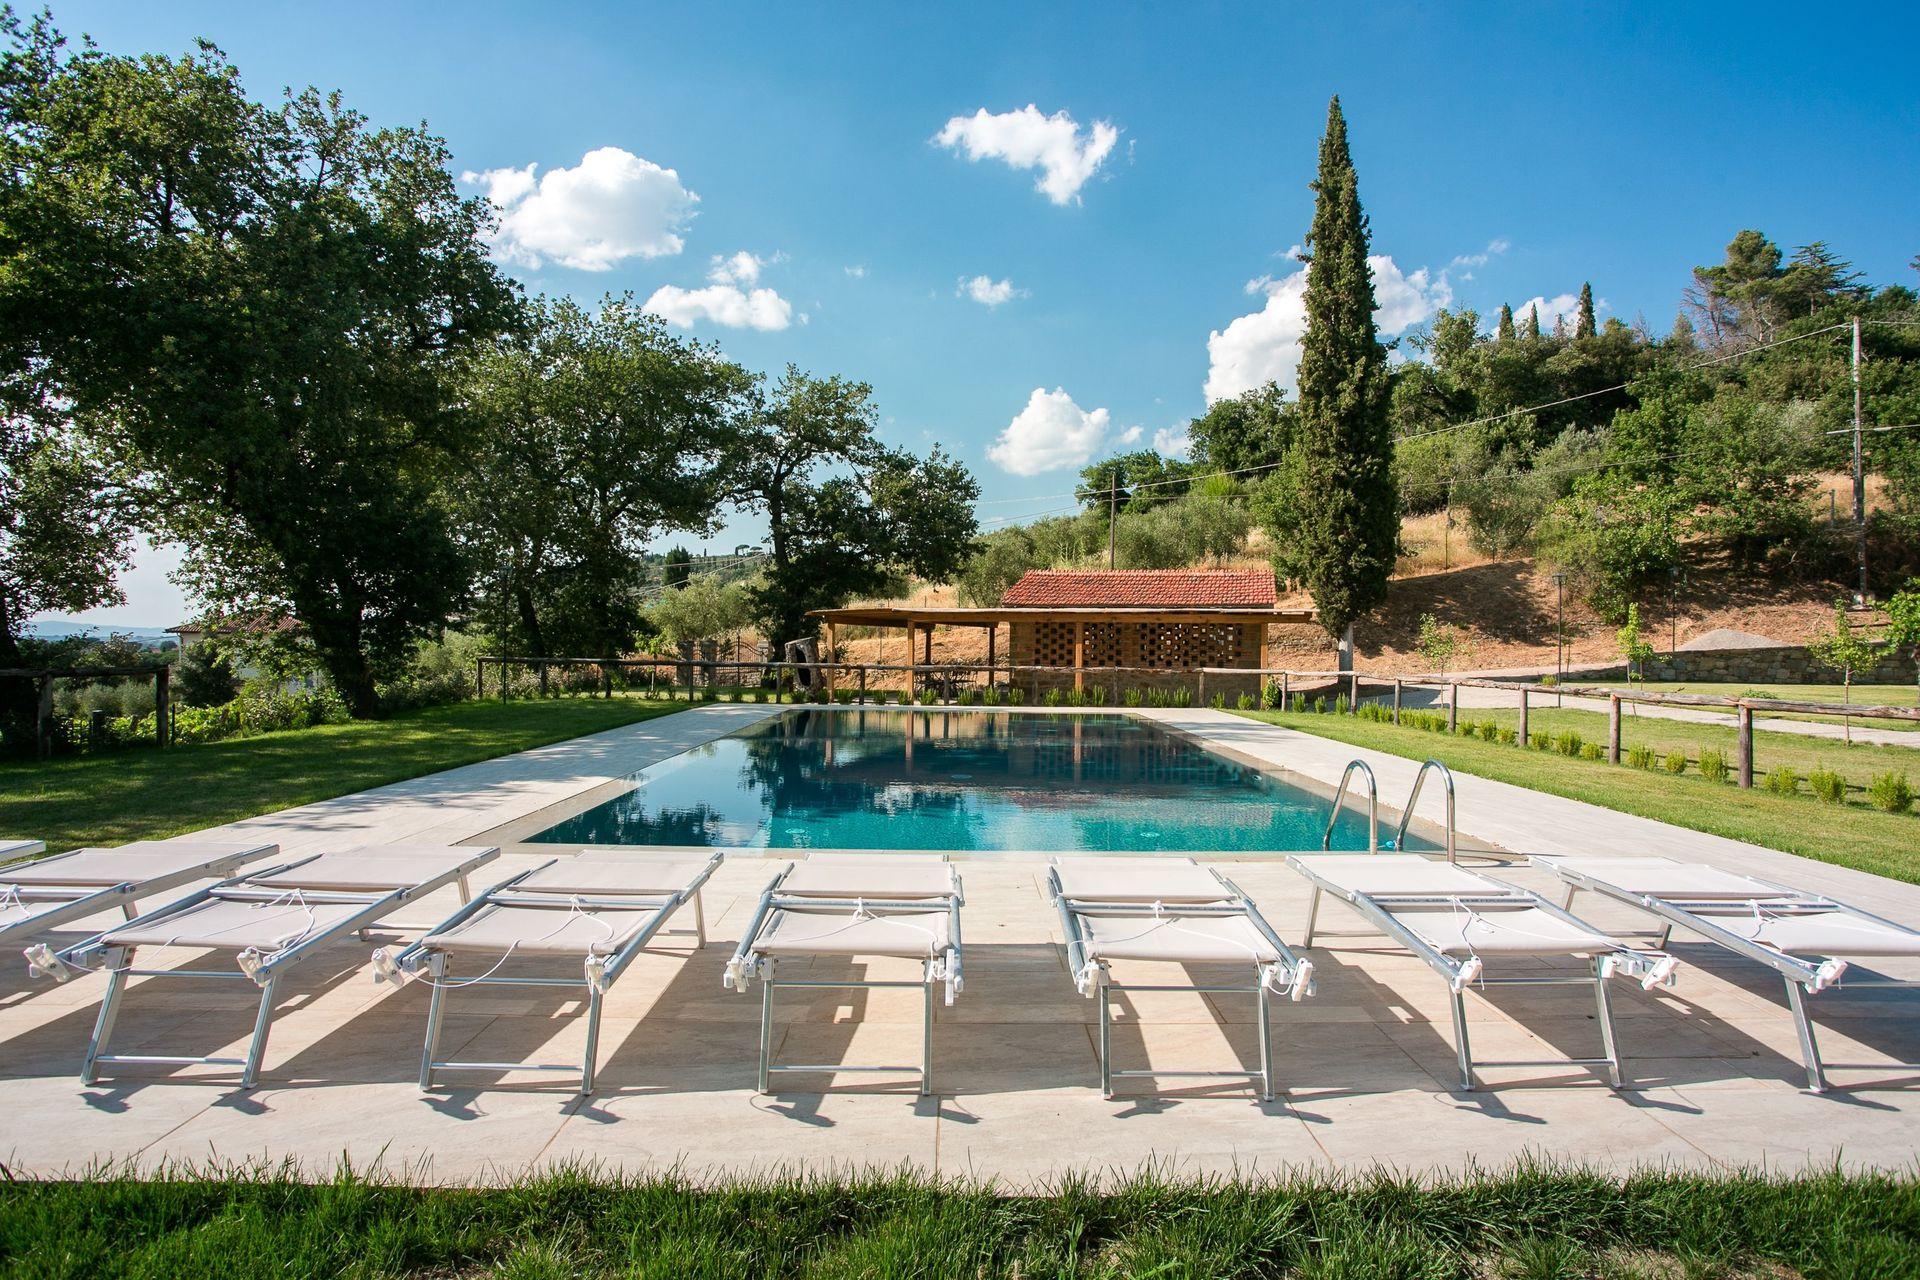 Villa Mezzavia - Ferienhäuser Toskana für Personen mit ...